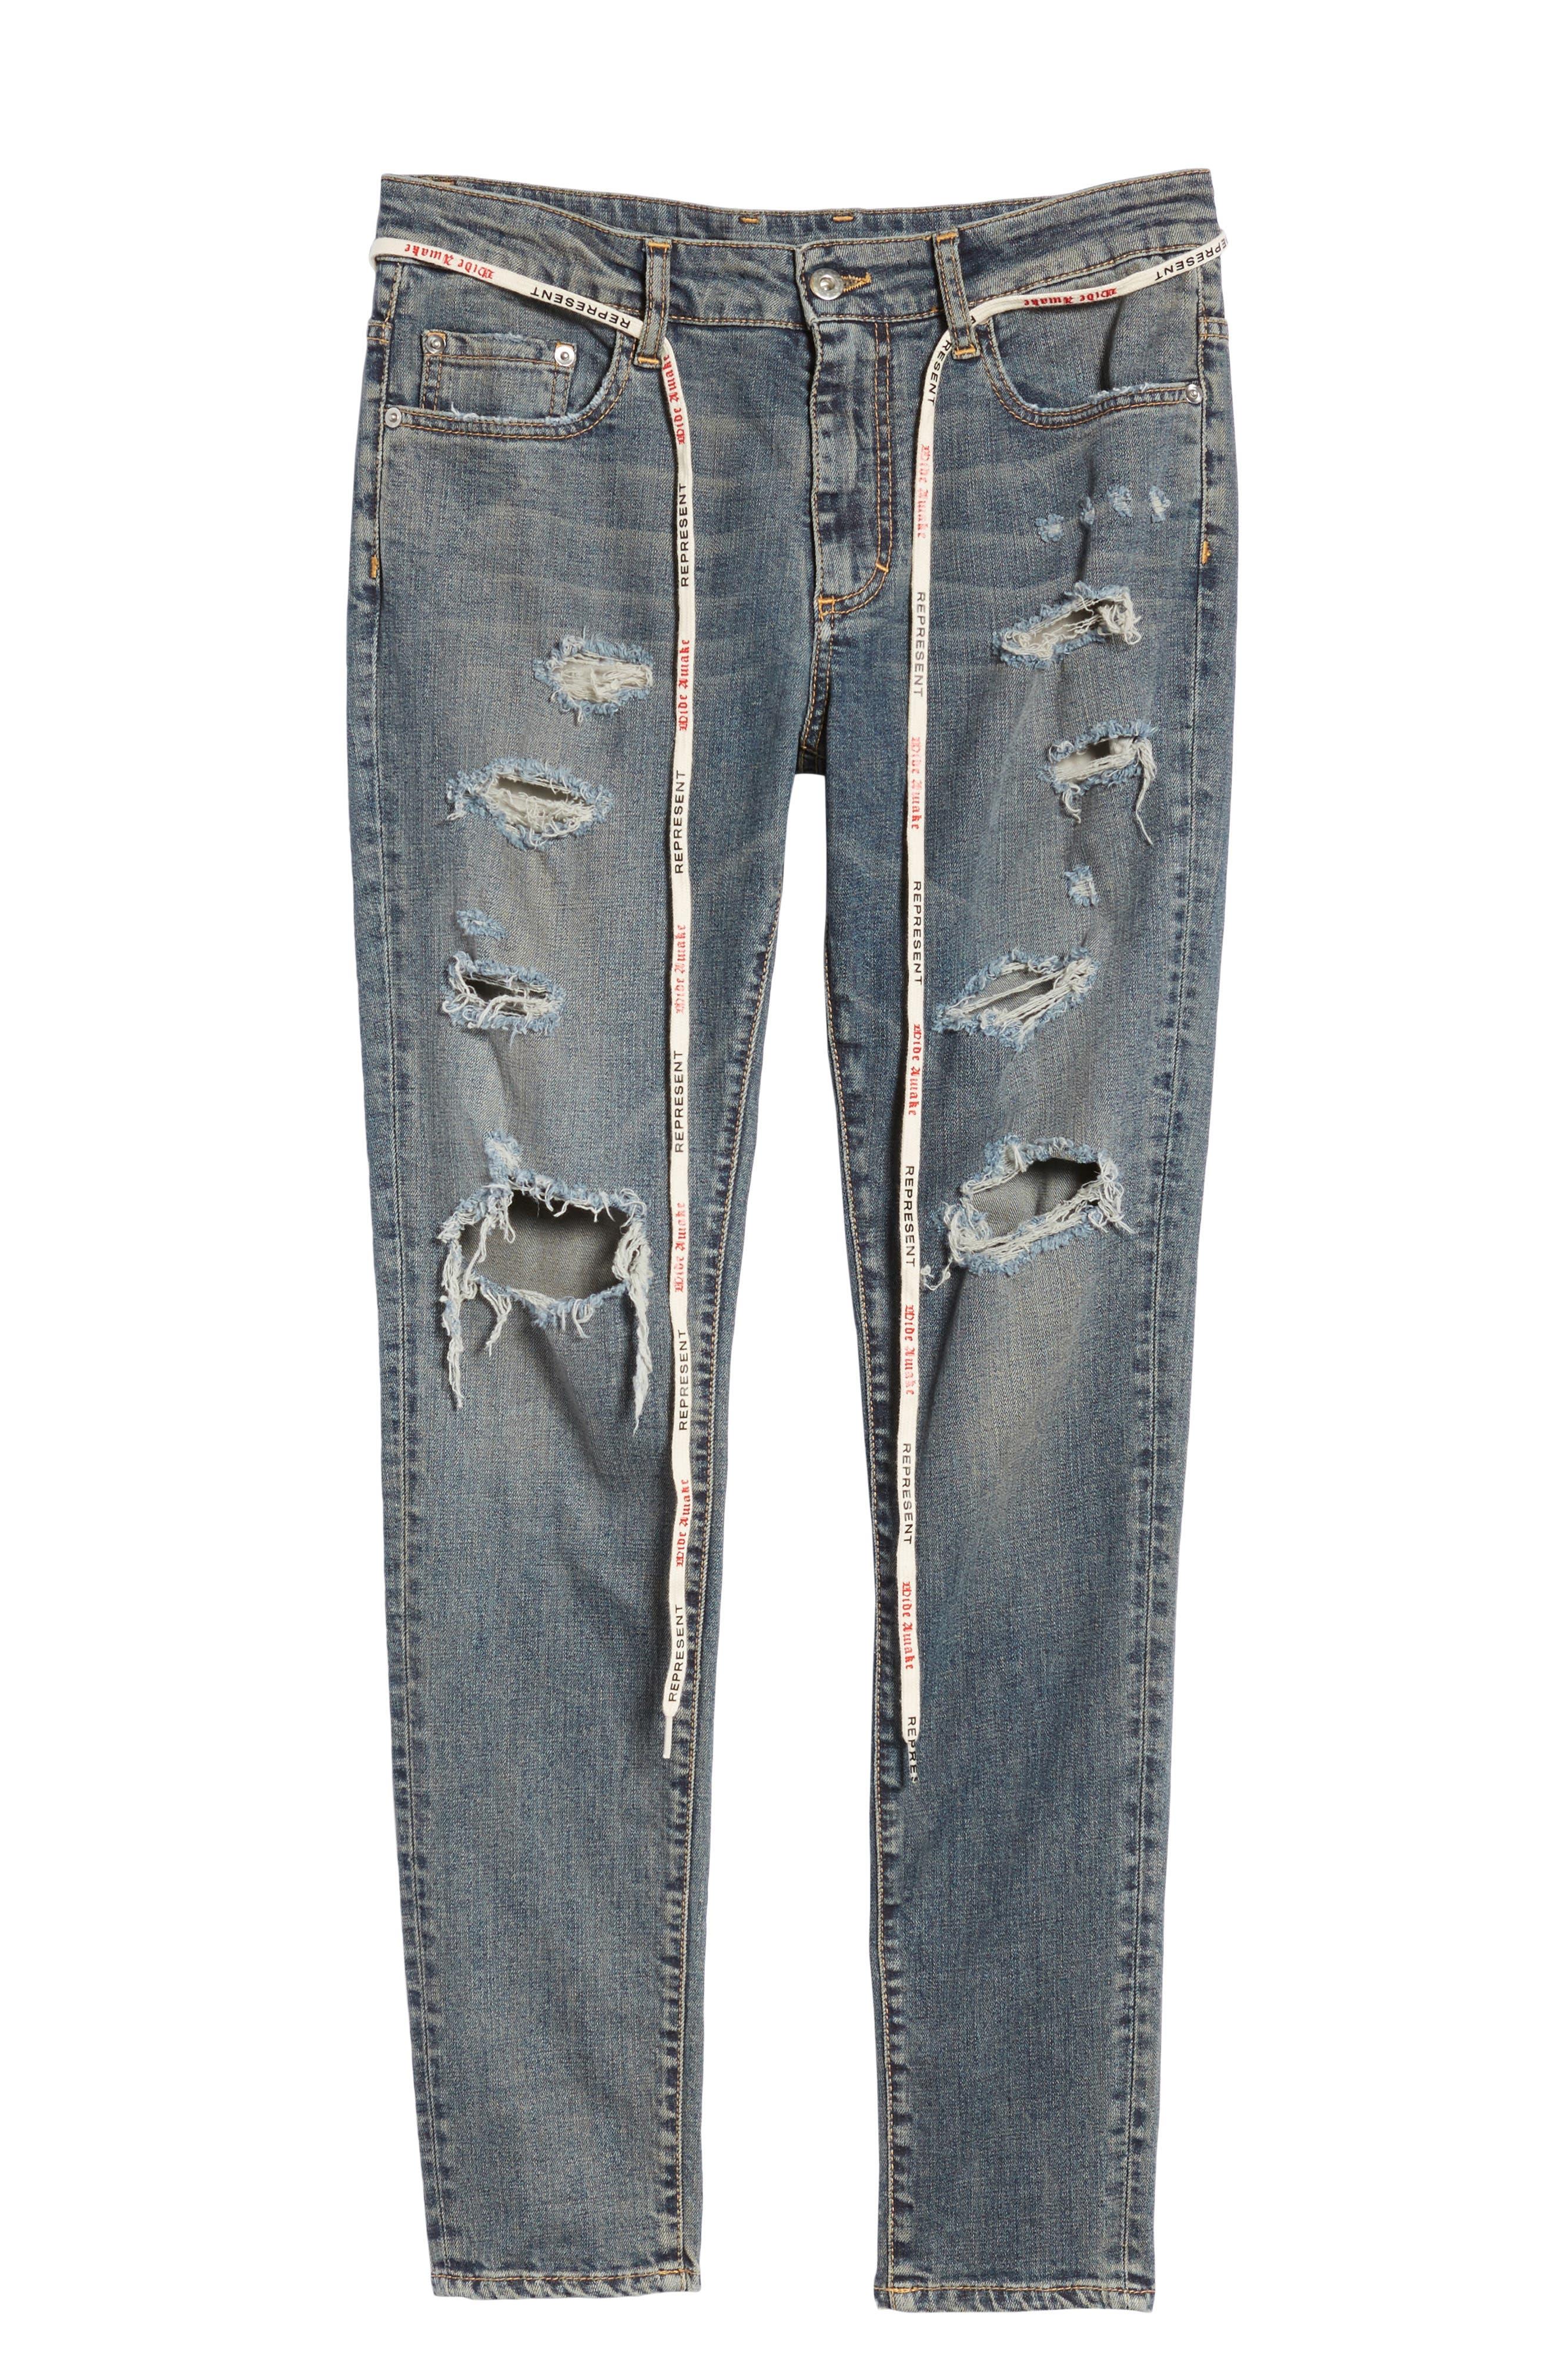 Repairer Slim Fit Denim Pants,                             Alternate thumbnail 6, color,                             ROCKSTAR BLUE